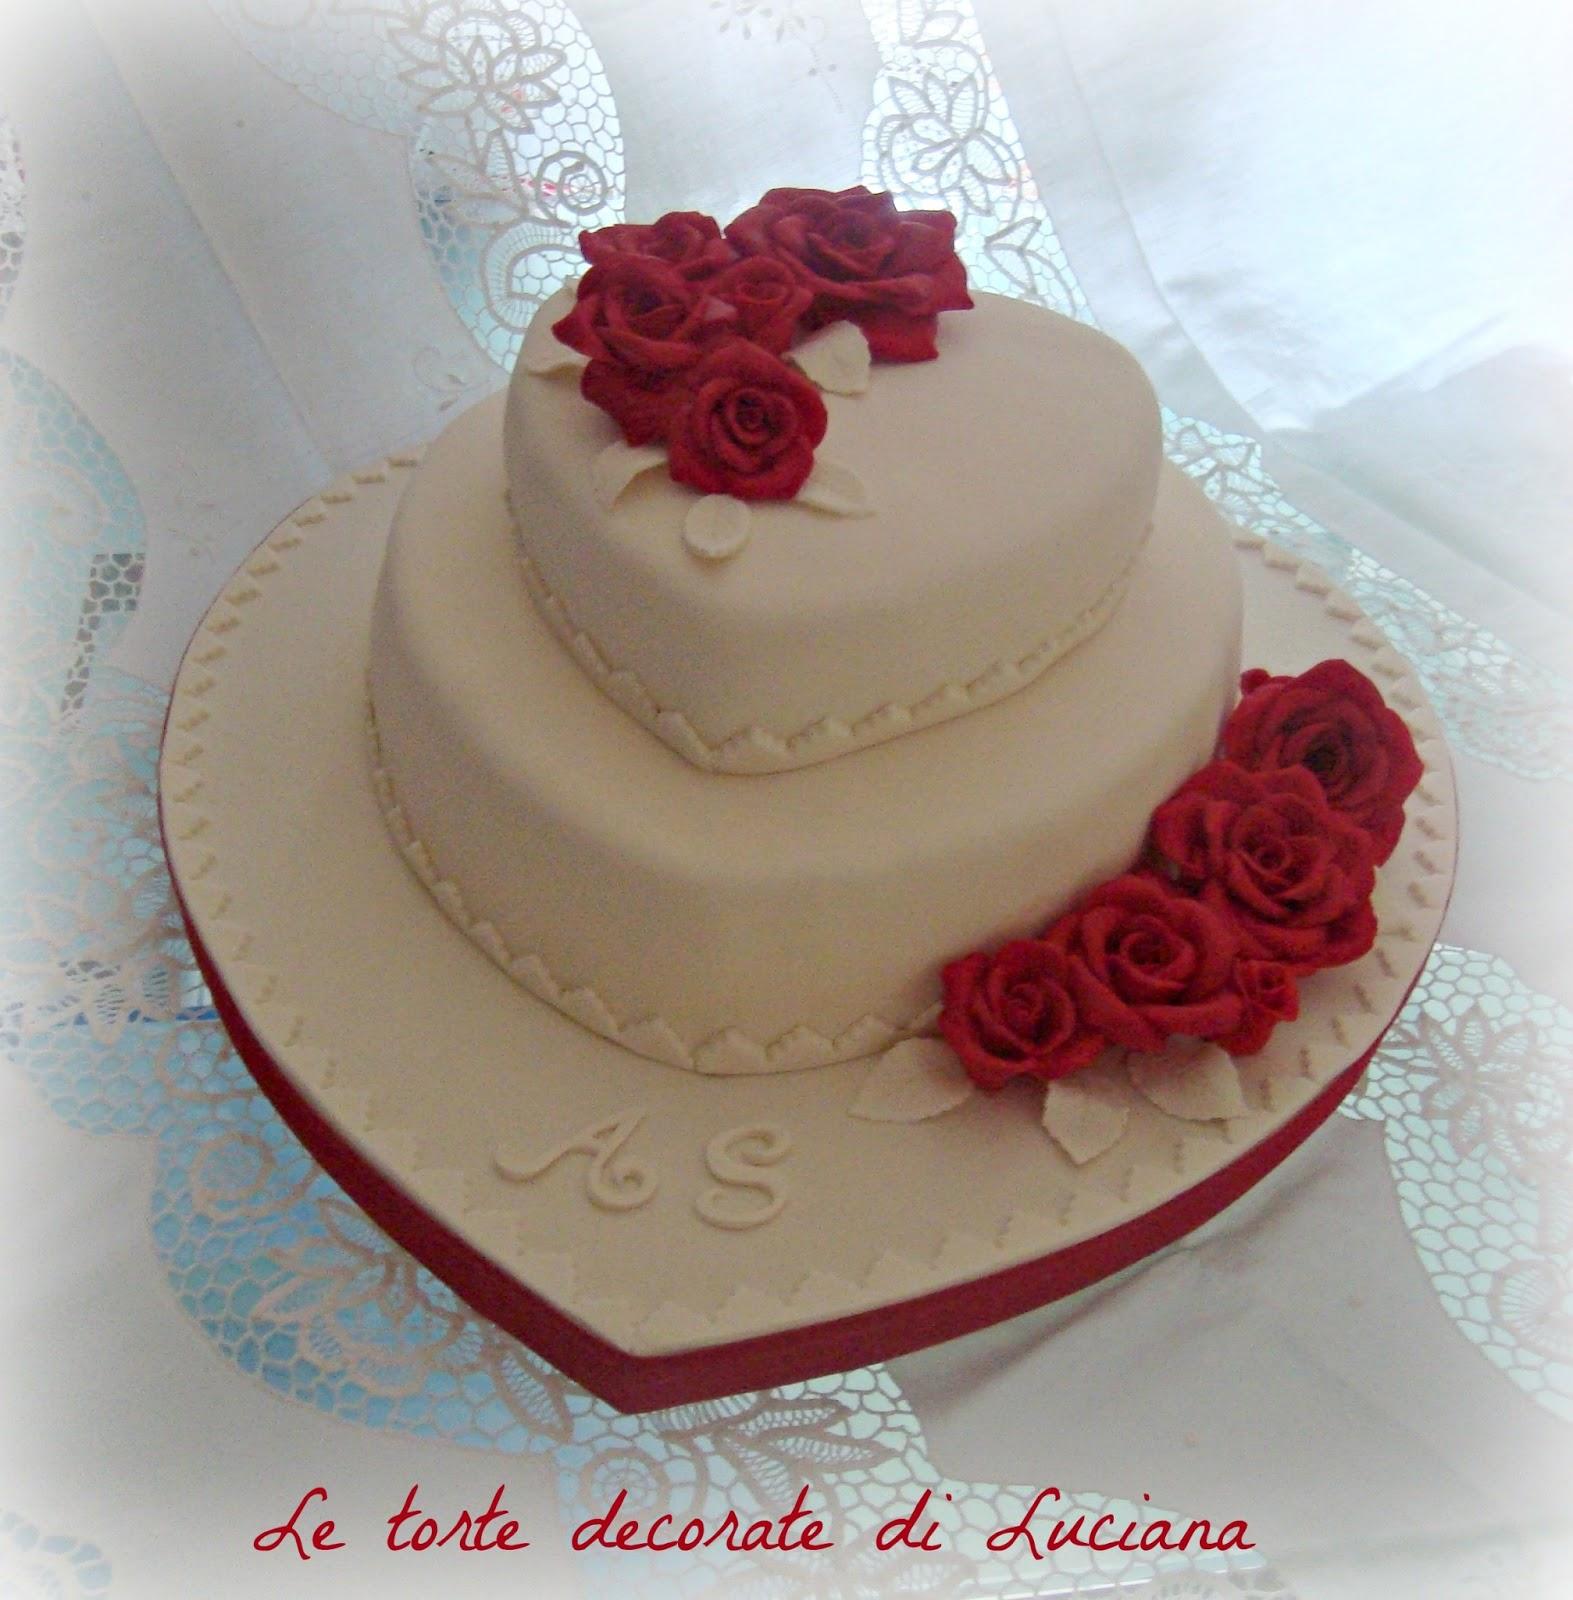 le torte decorate: torta matrimonio cuori e rose rosse ...